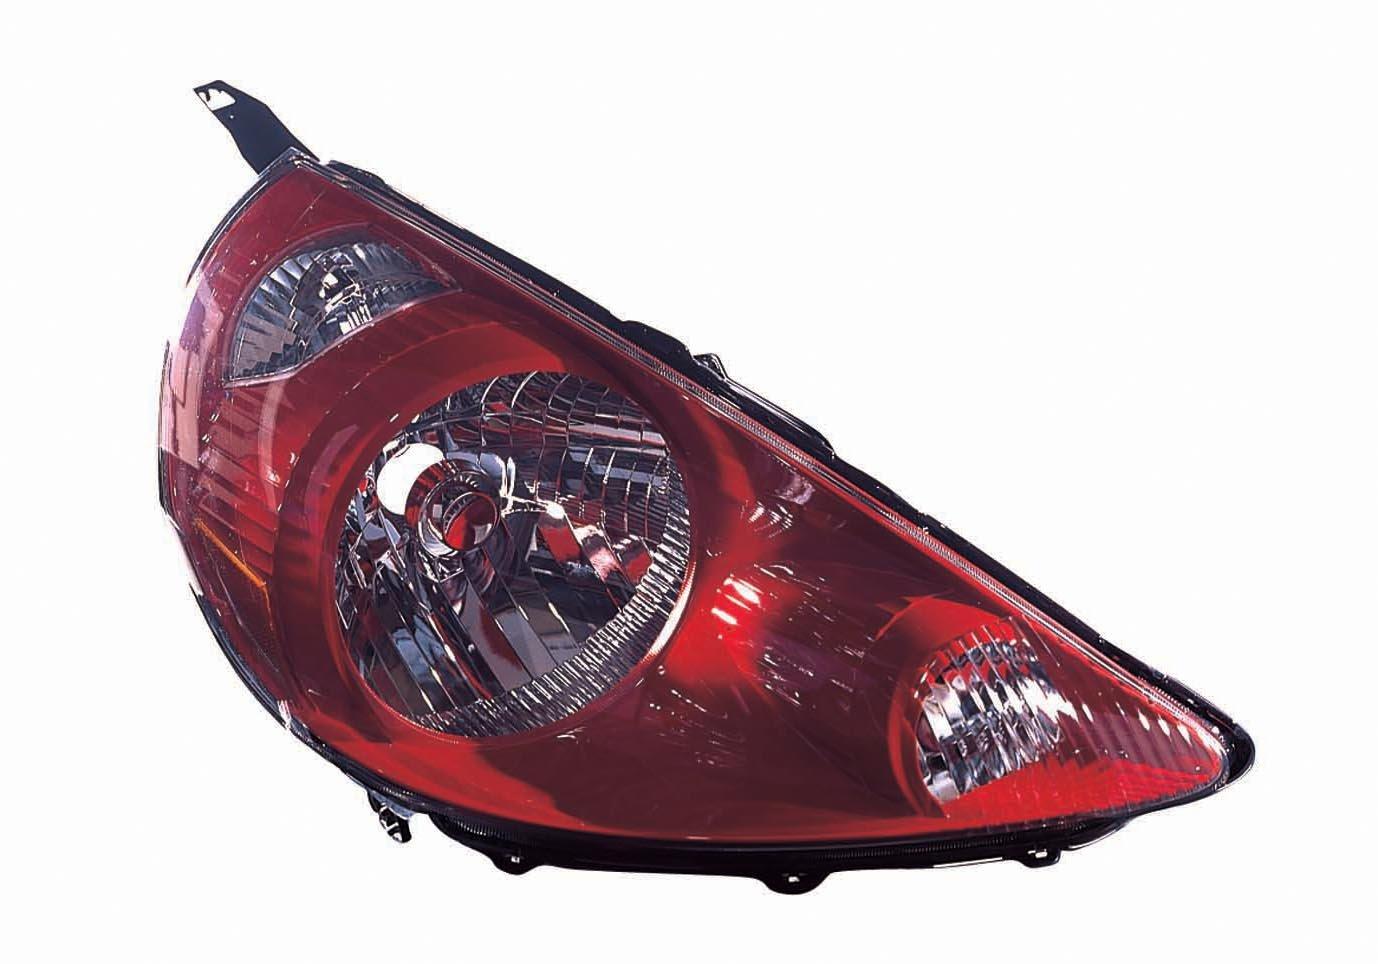 Depo 317-1151R-US4 Honda Fit Passenger Side Headlamp Lens and Housing